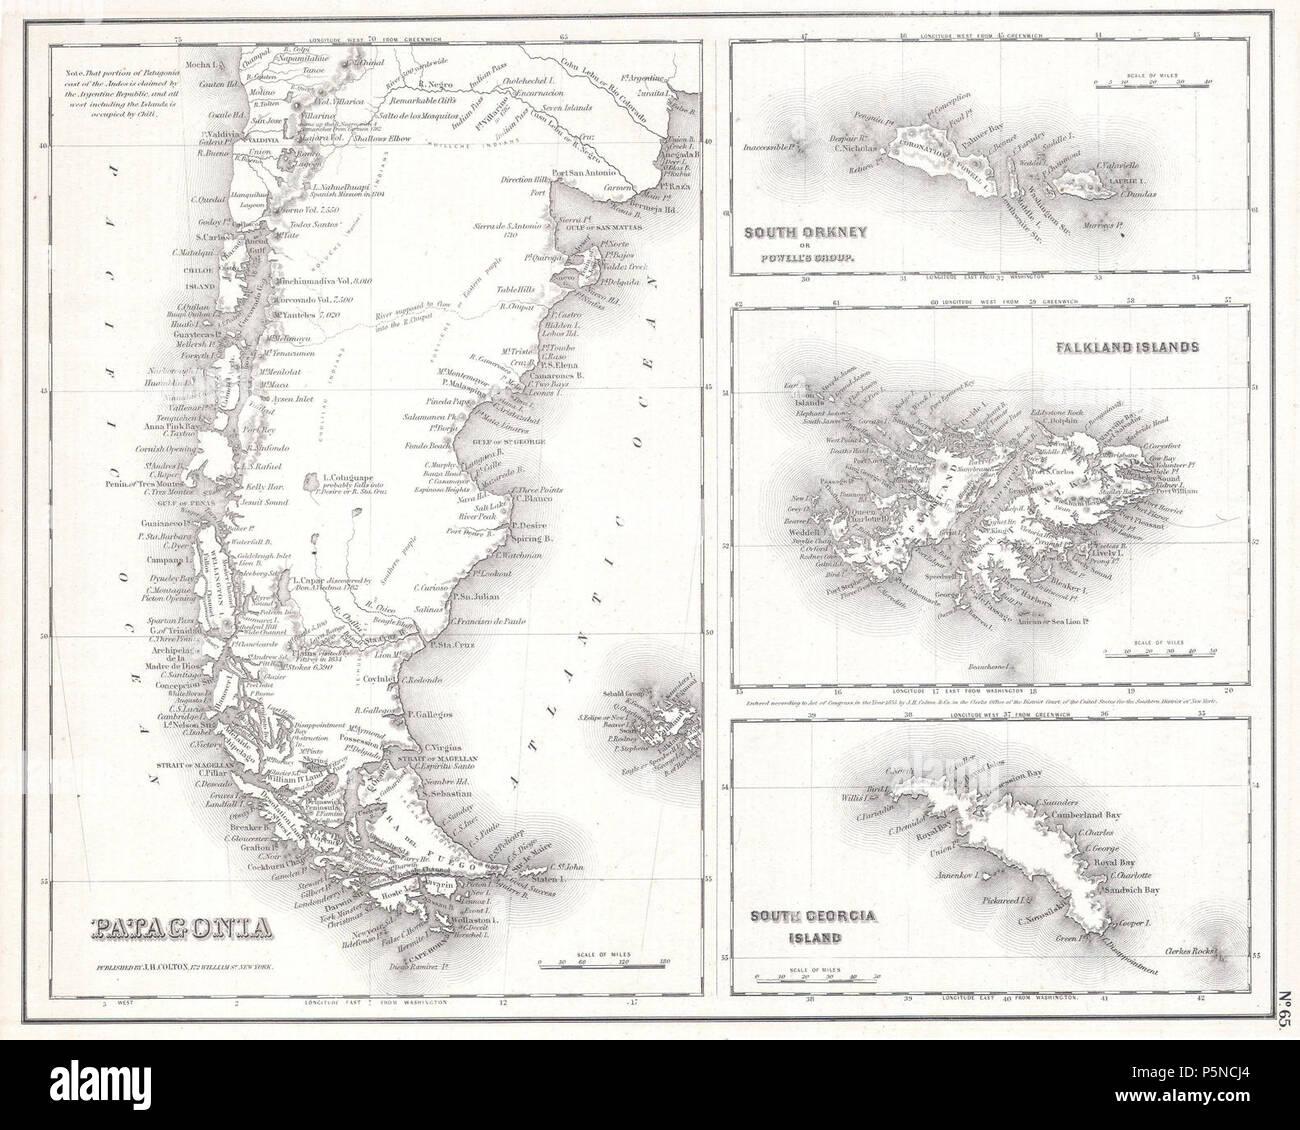 1855 Map of Patagonia, Argentina (Falkland Islands) - Geographicus - Patagonia-cbl-1855. - Stock Image